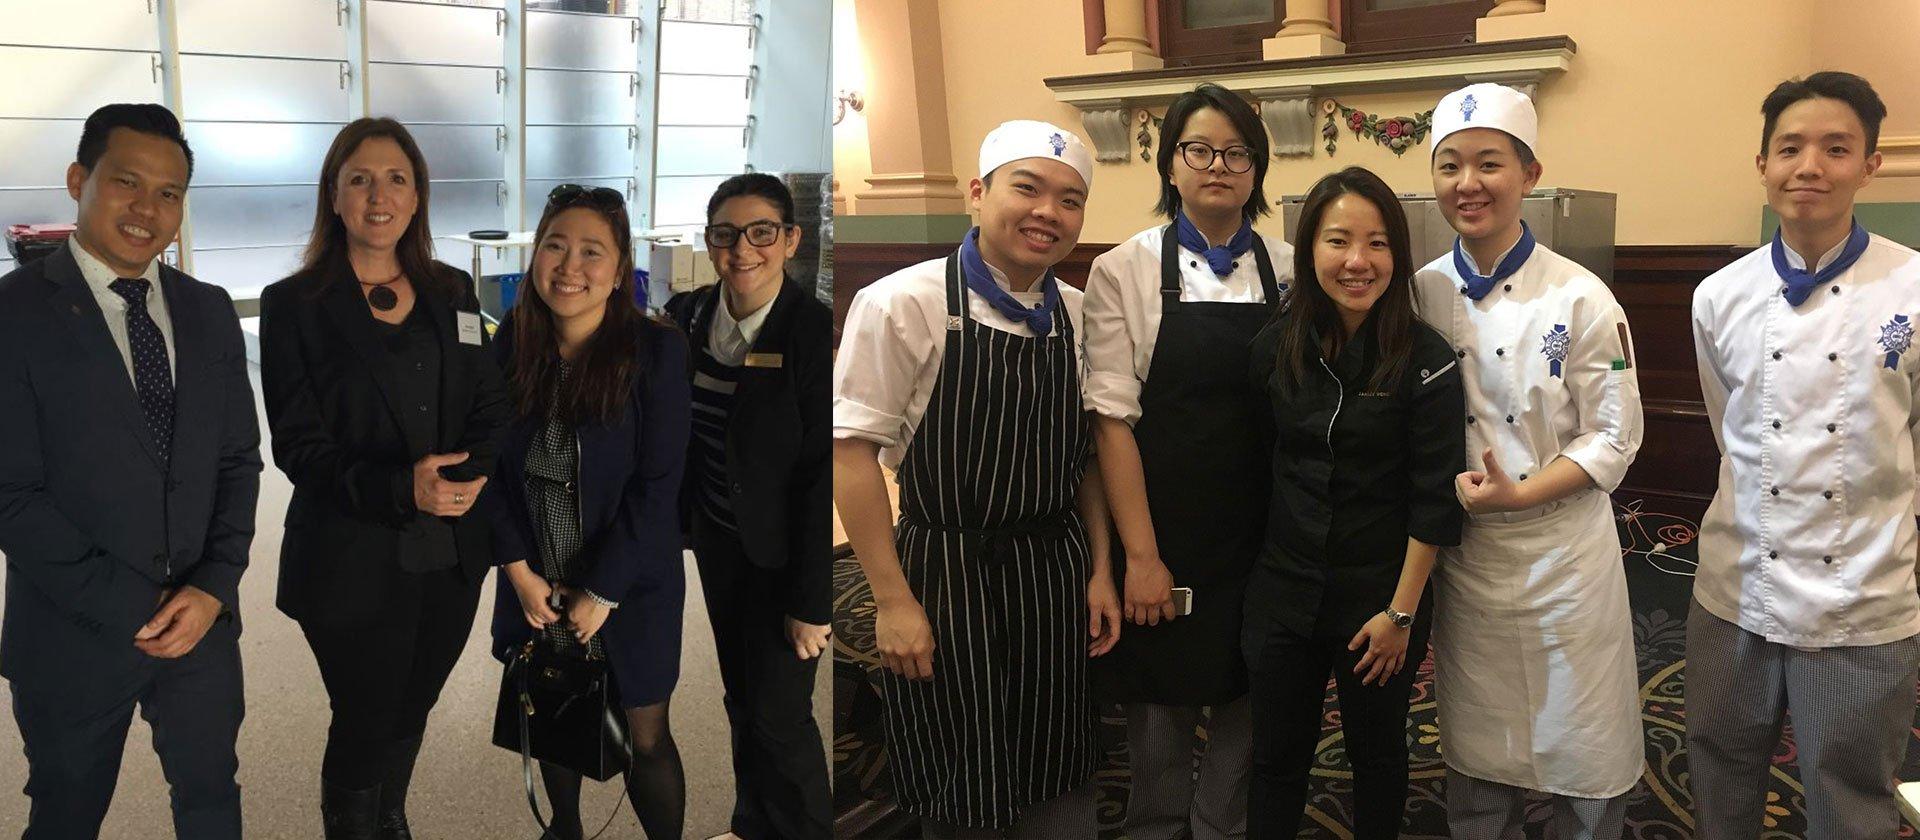 Le Cordon Bleu Australia at Asia in SA and Flavour of NSW